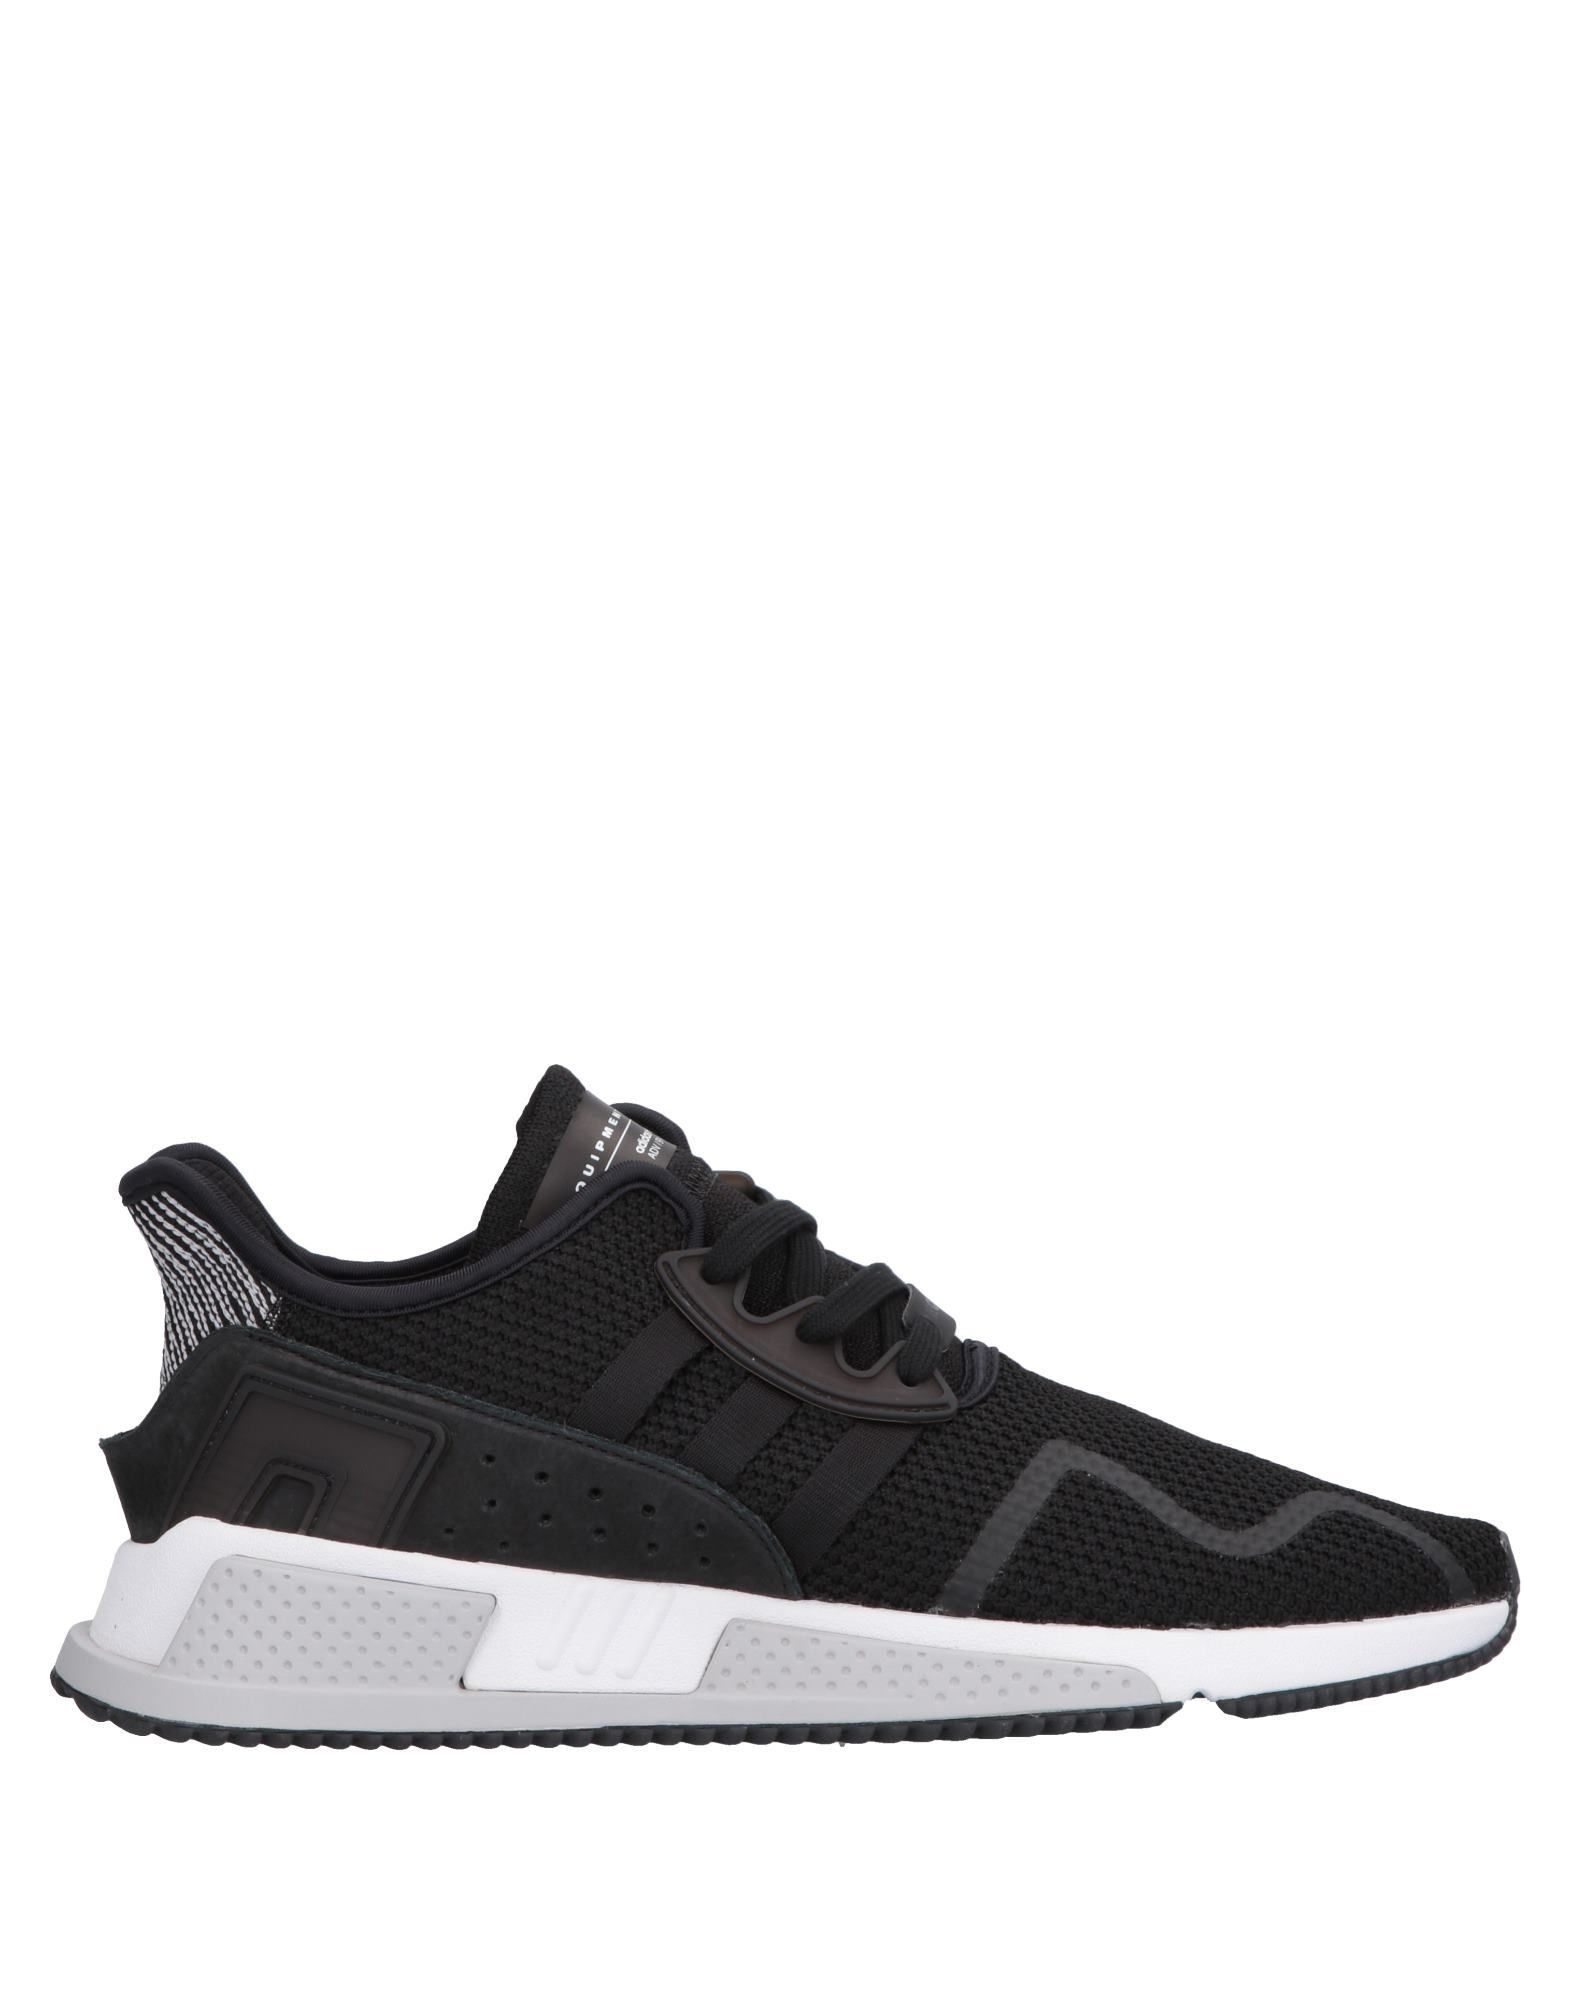 Turnschuhe Adidas Originals herren - 11614707XG